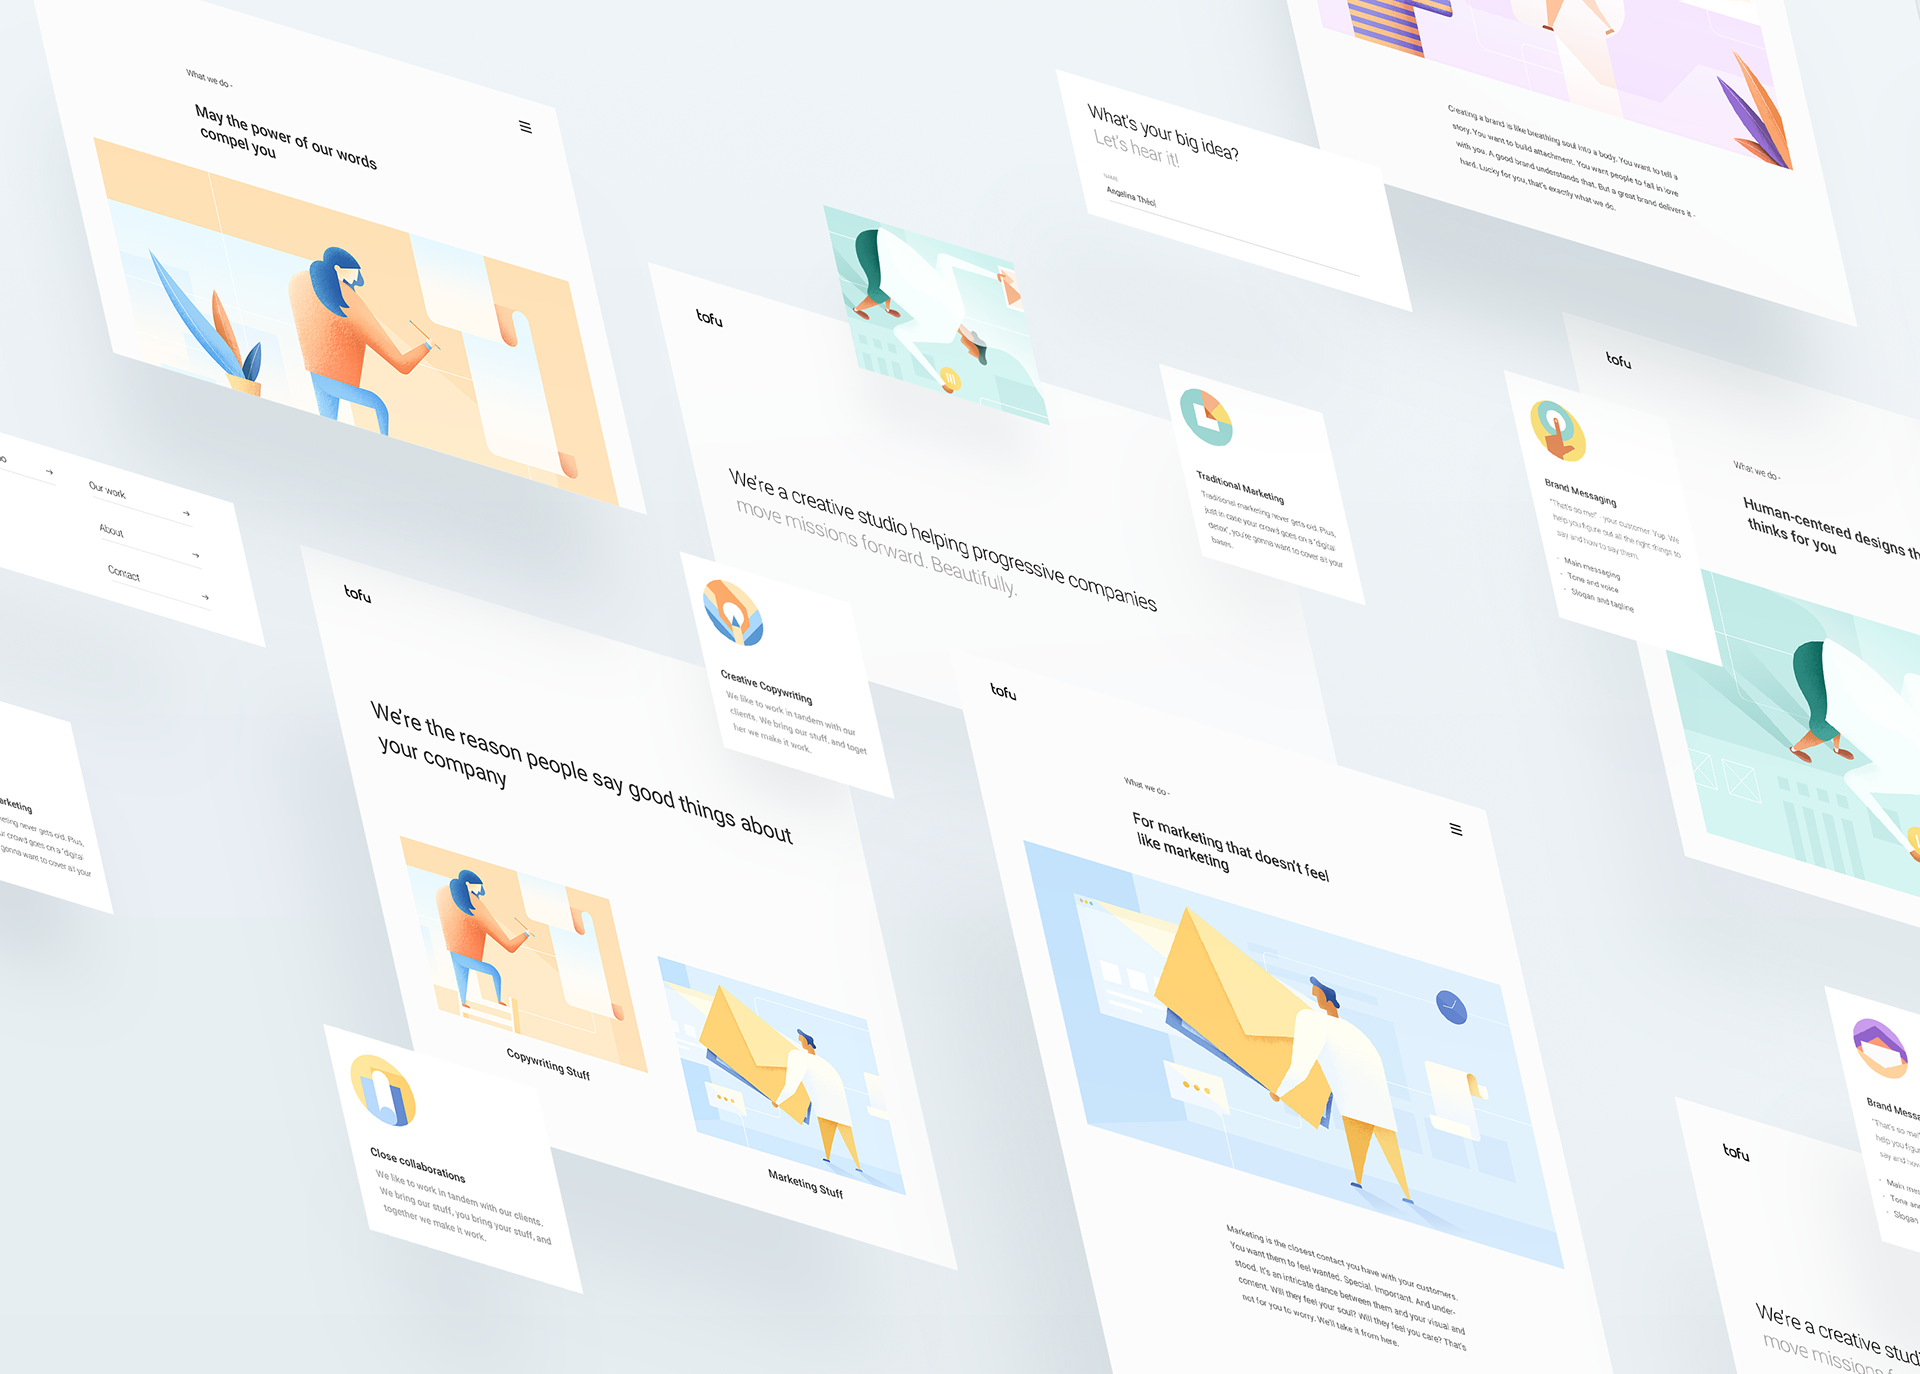 Daphnie Loong, talentueuse Webdesigner et Designer d'interface #36